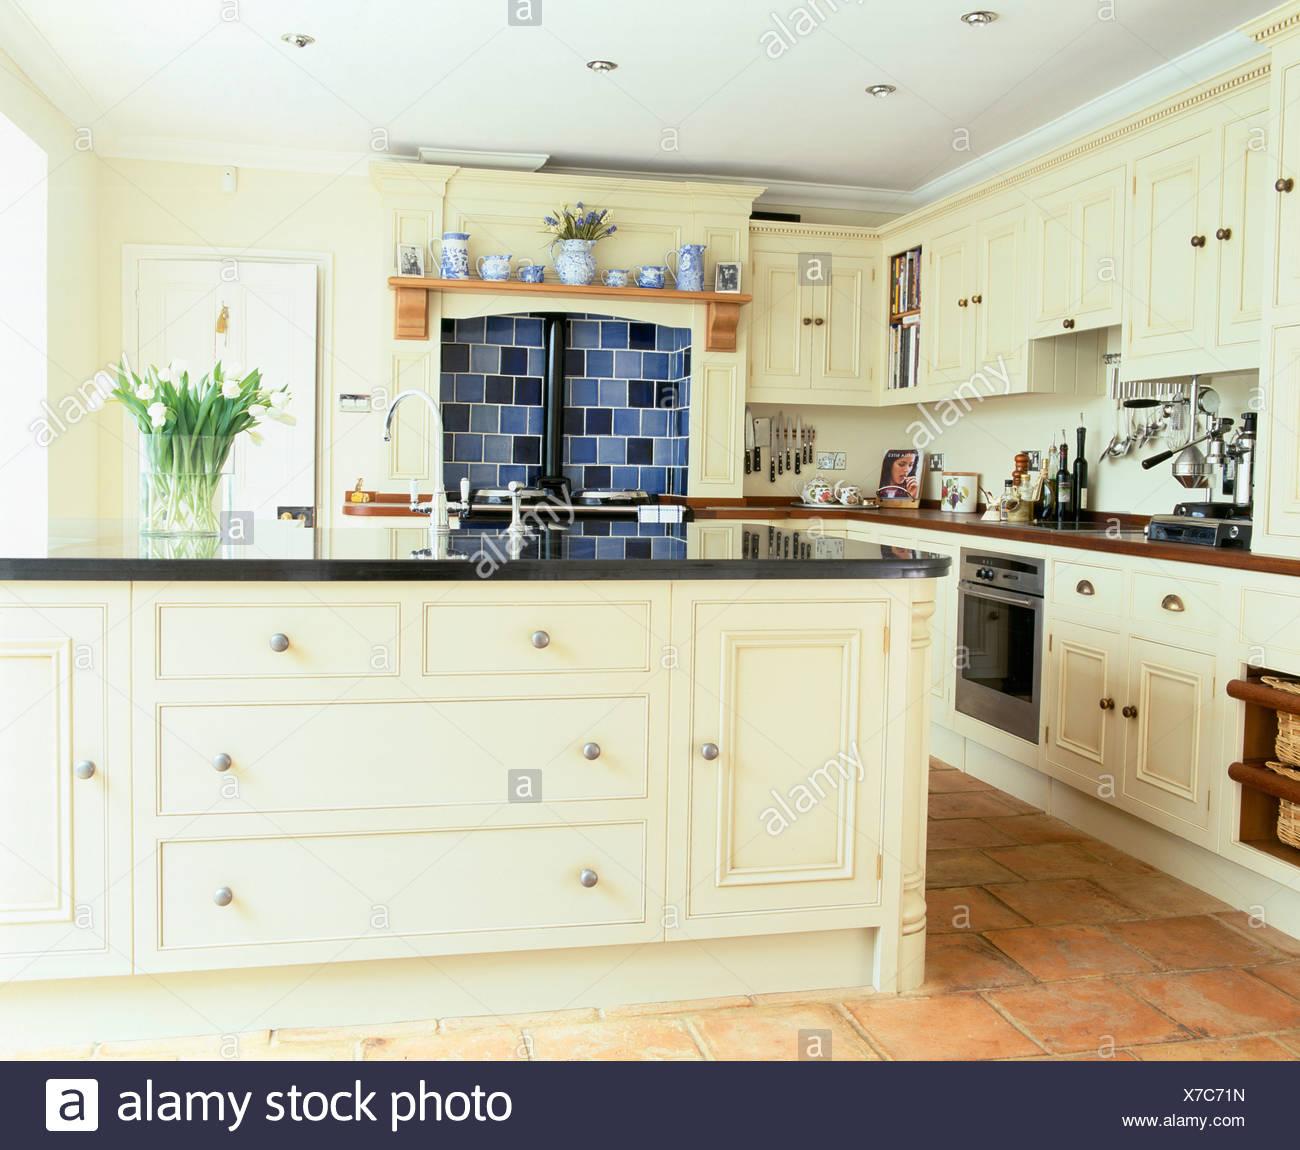 Interiors Traditional Cream Kitchens Imágenes De Stock & Interiors ...